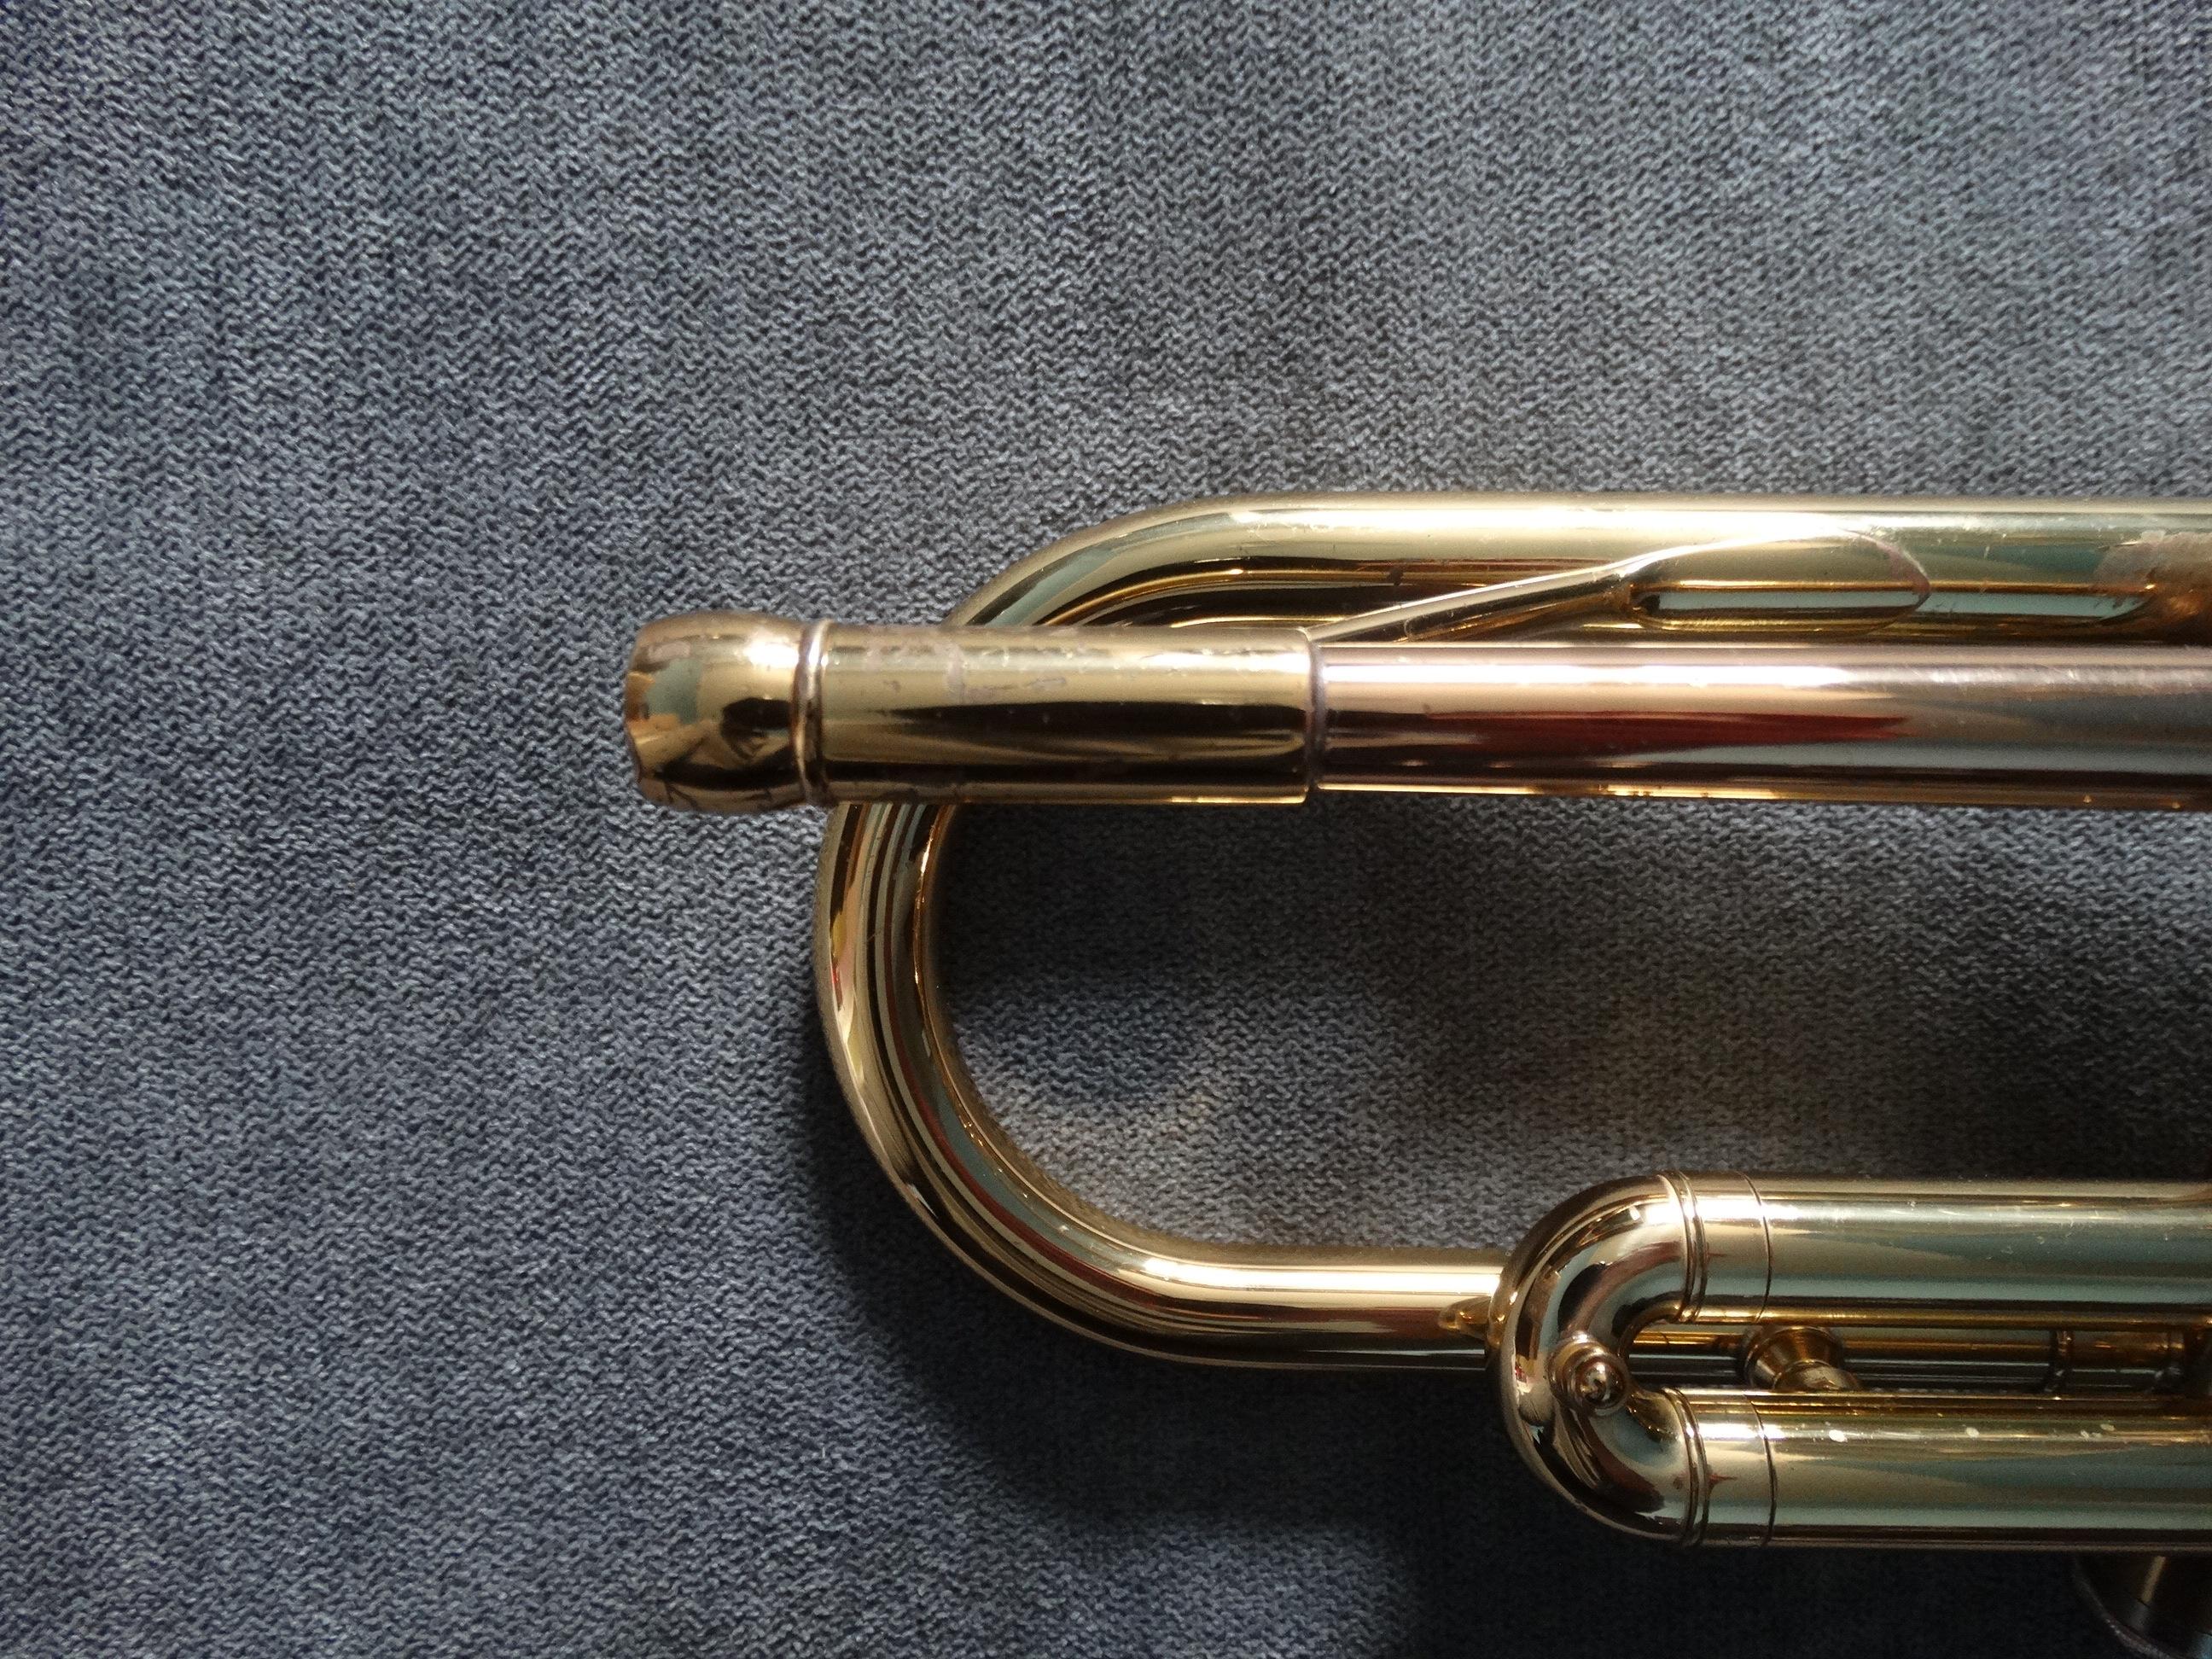 Yamaha 1335 - Made in JAPAN  (422178)